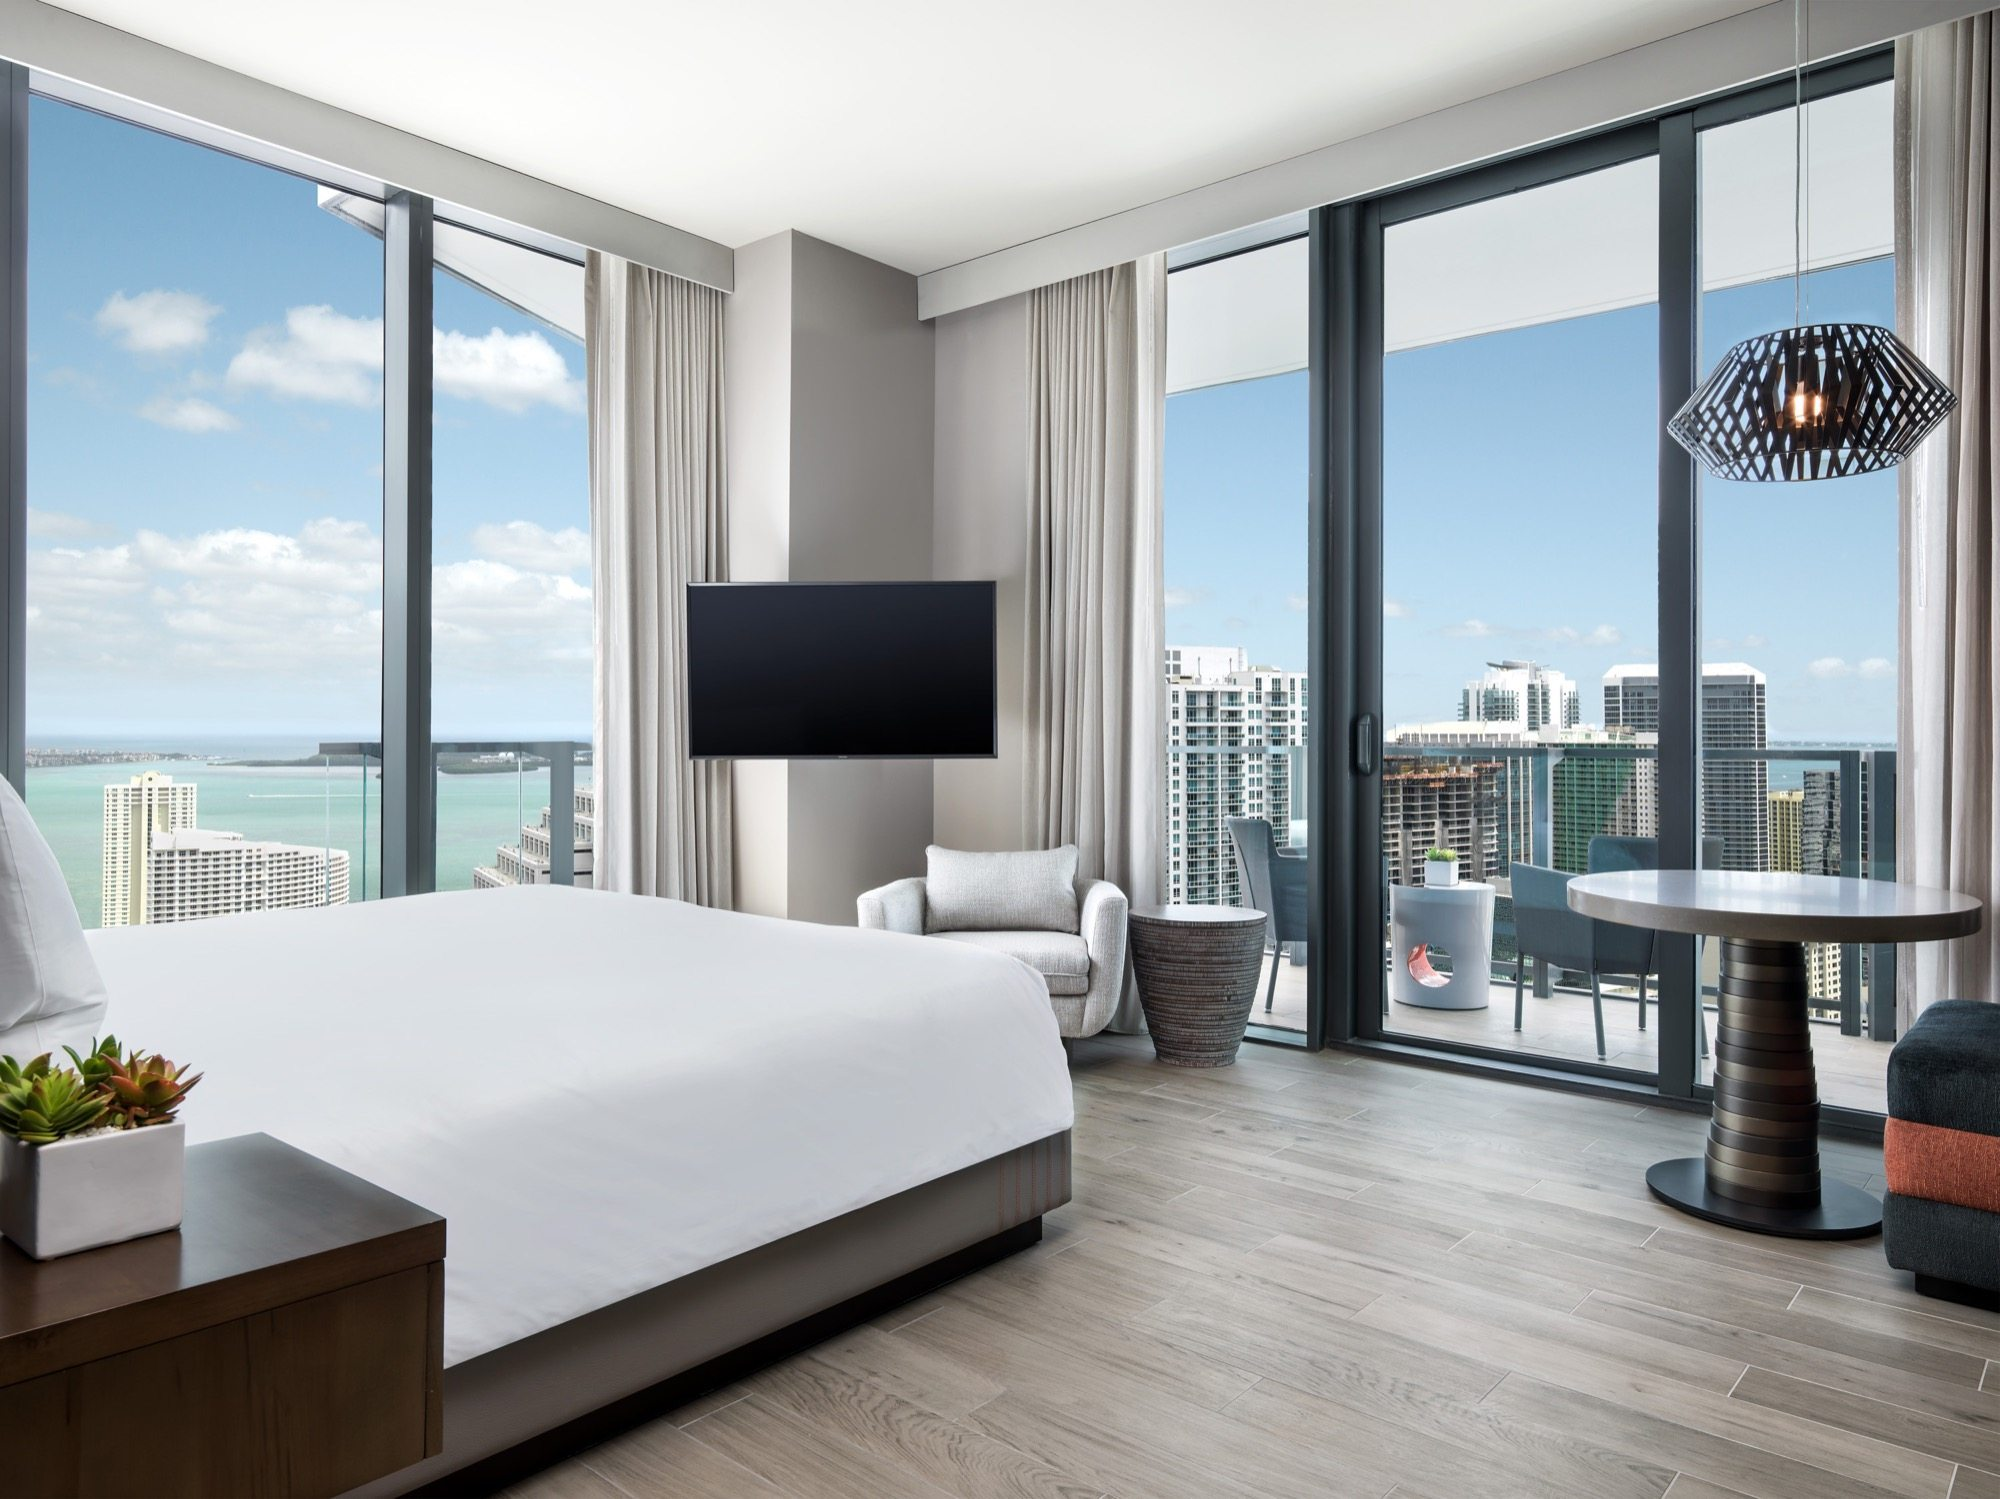 East Hotel Miami-1